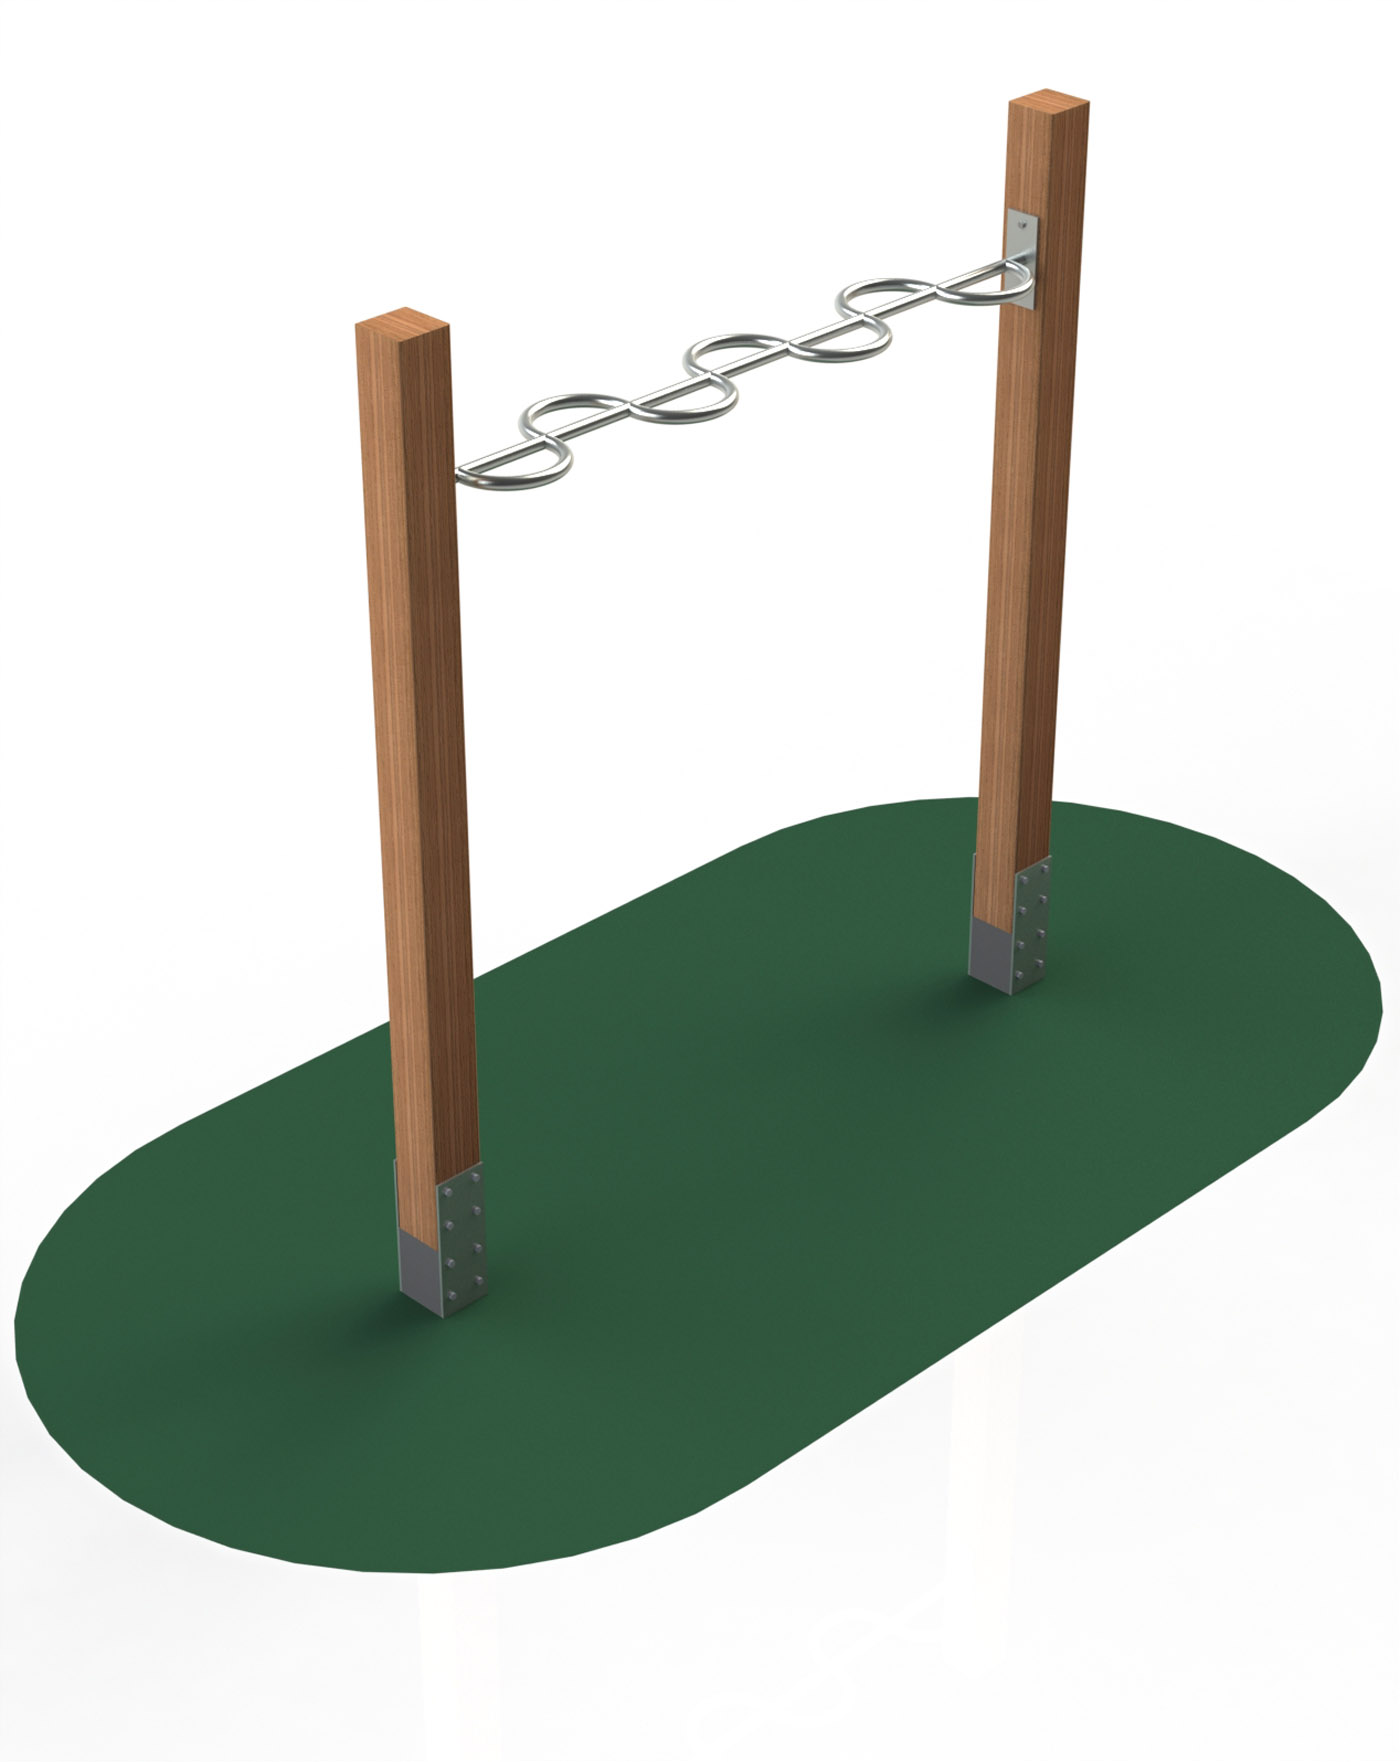 Snake on wooden poles